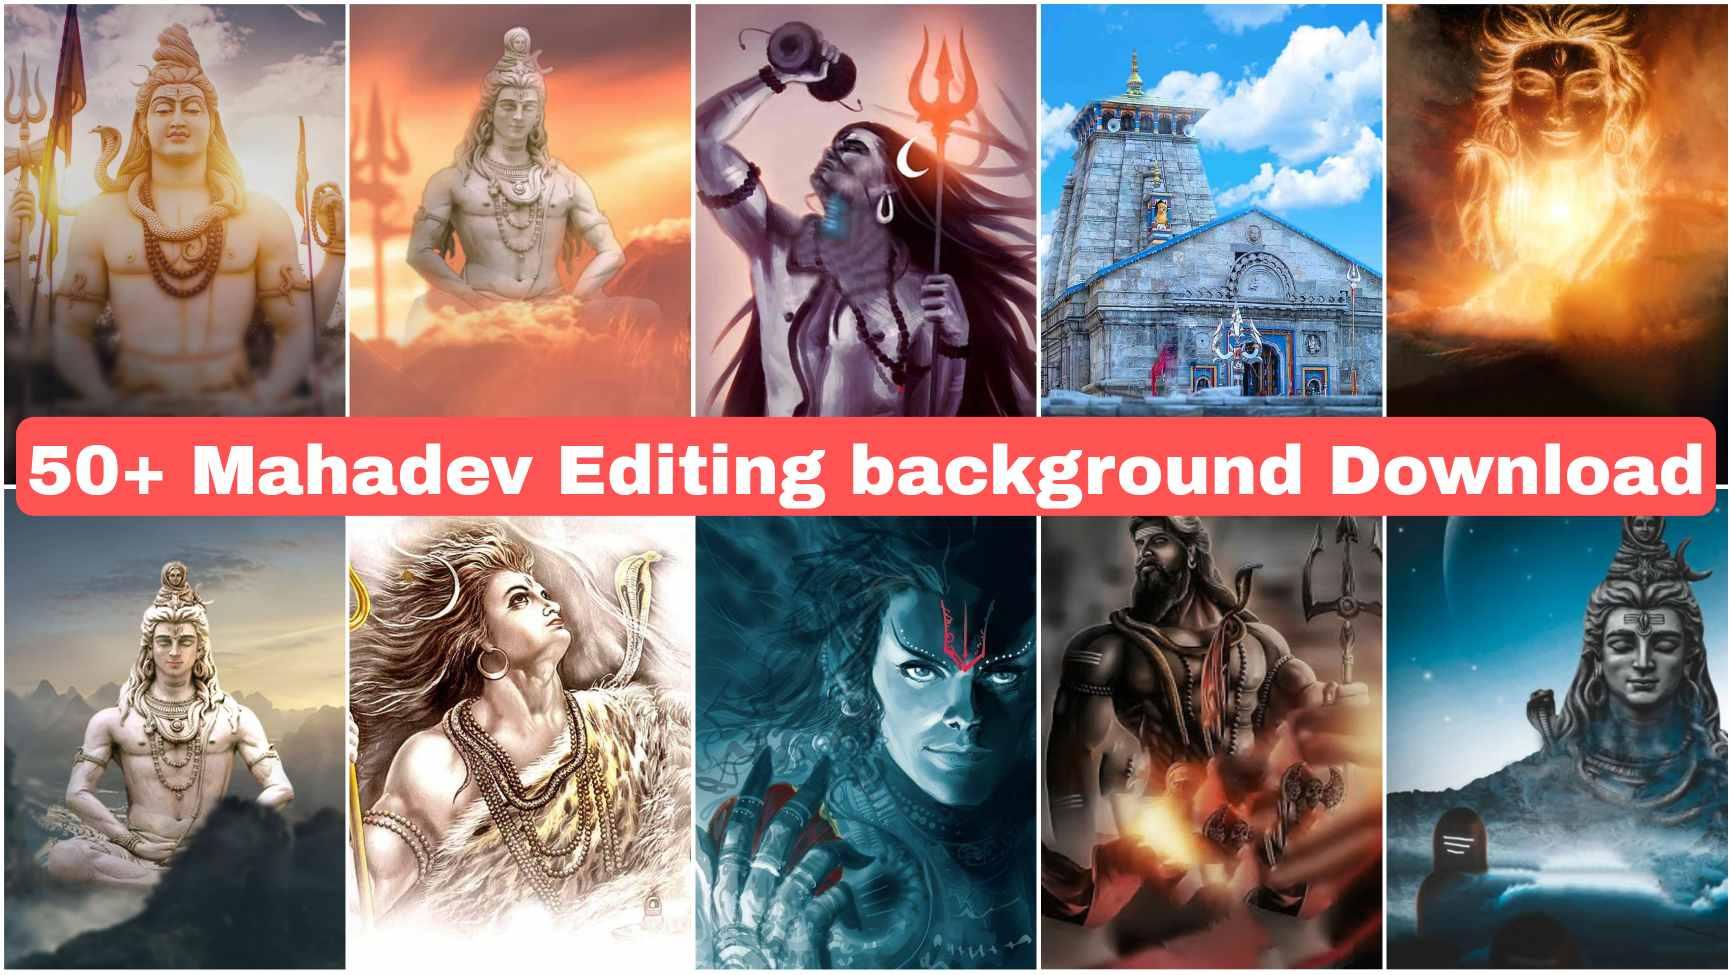 Mahadev editing background